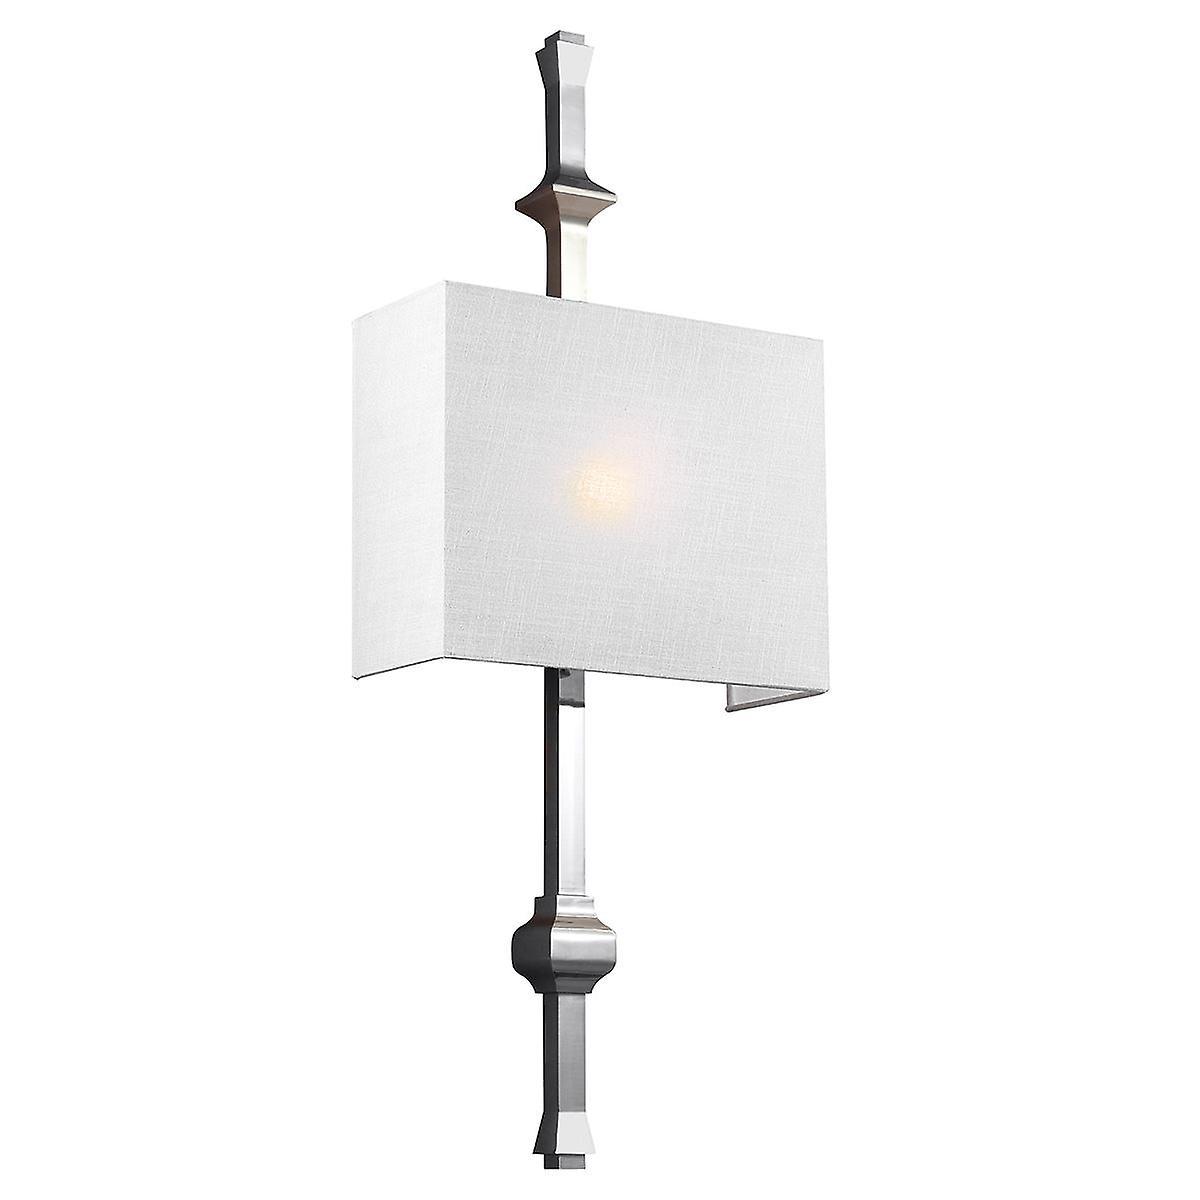 Elstead - 1 lumière Wall lumière - Polished Nickel - FE TEVA1 PN